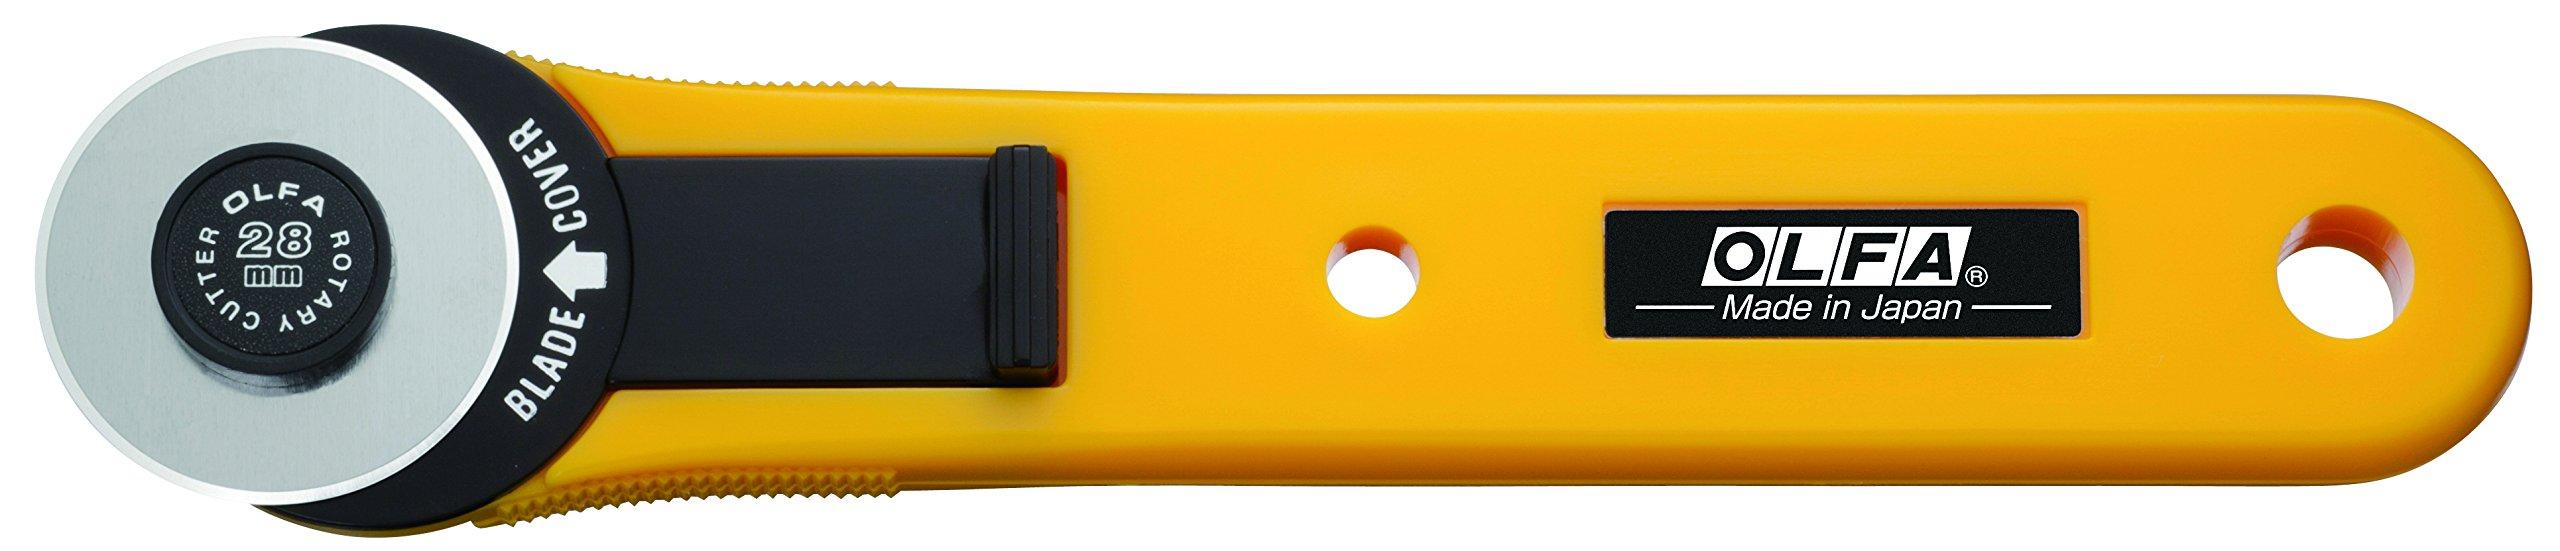 OLFA 9551 RTY-1/G 28mm Straight Handle Rotary Cutter by OLFA